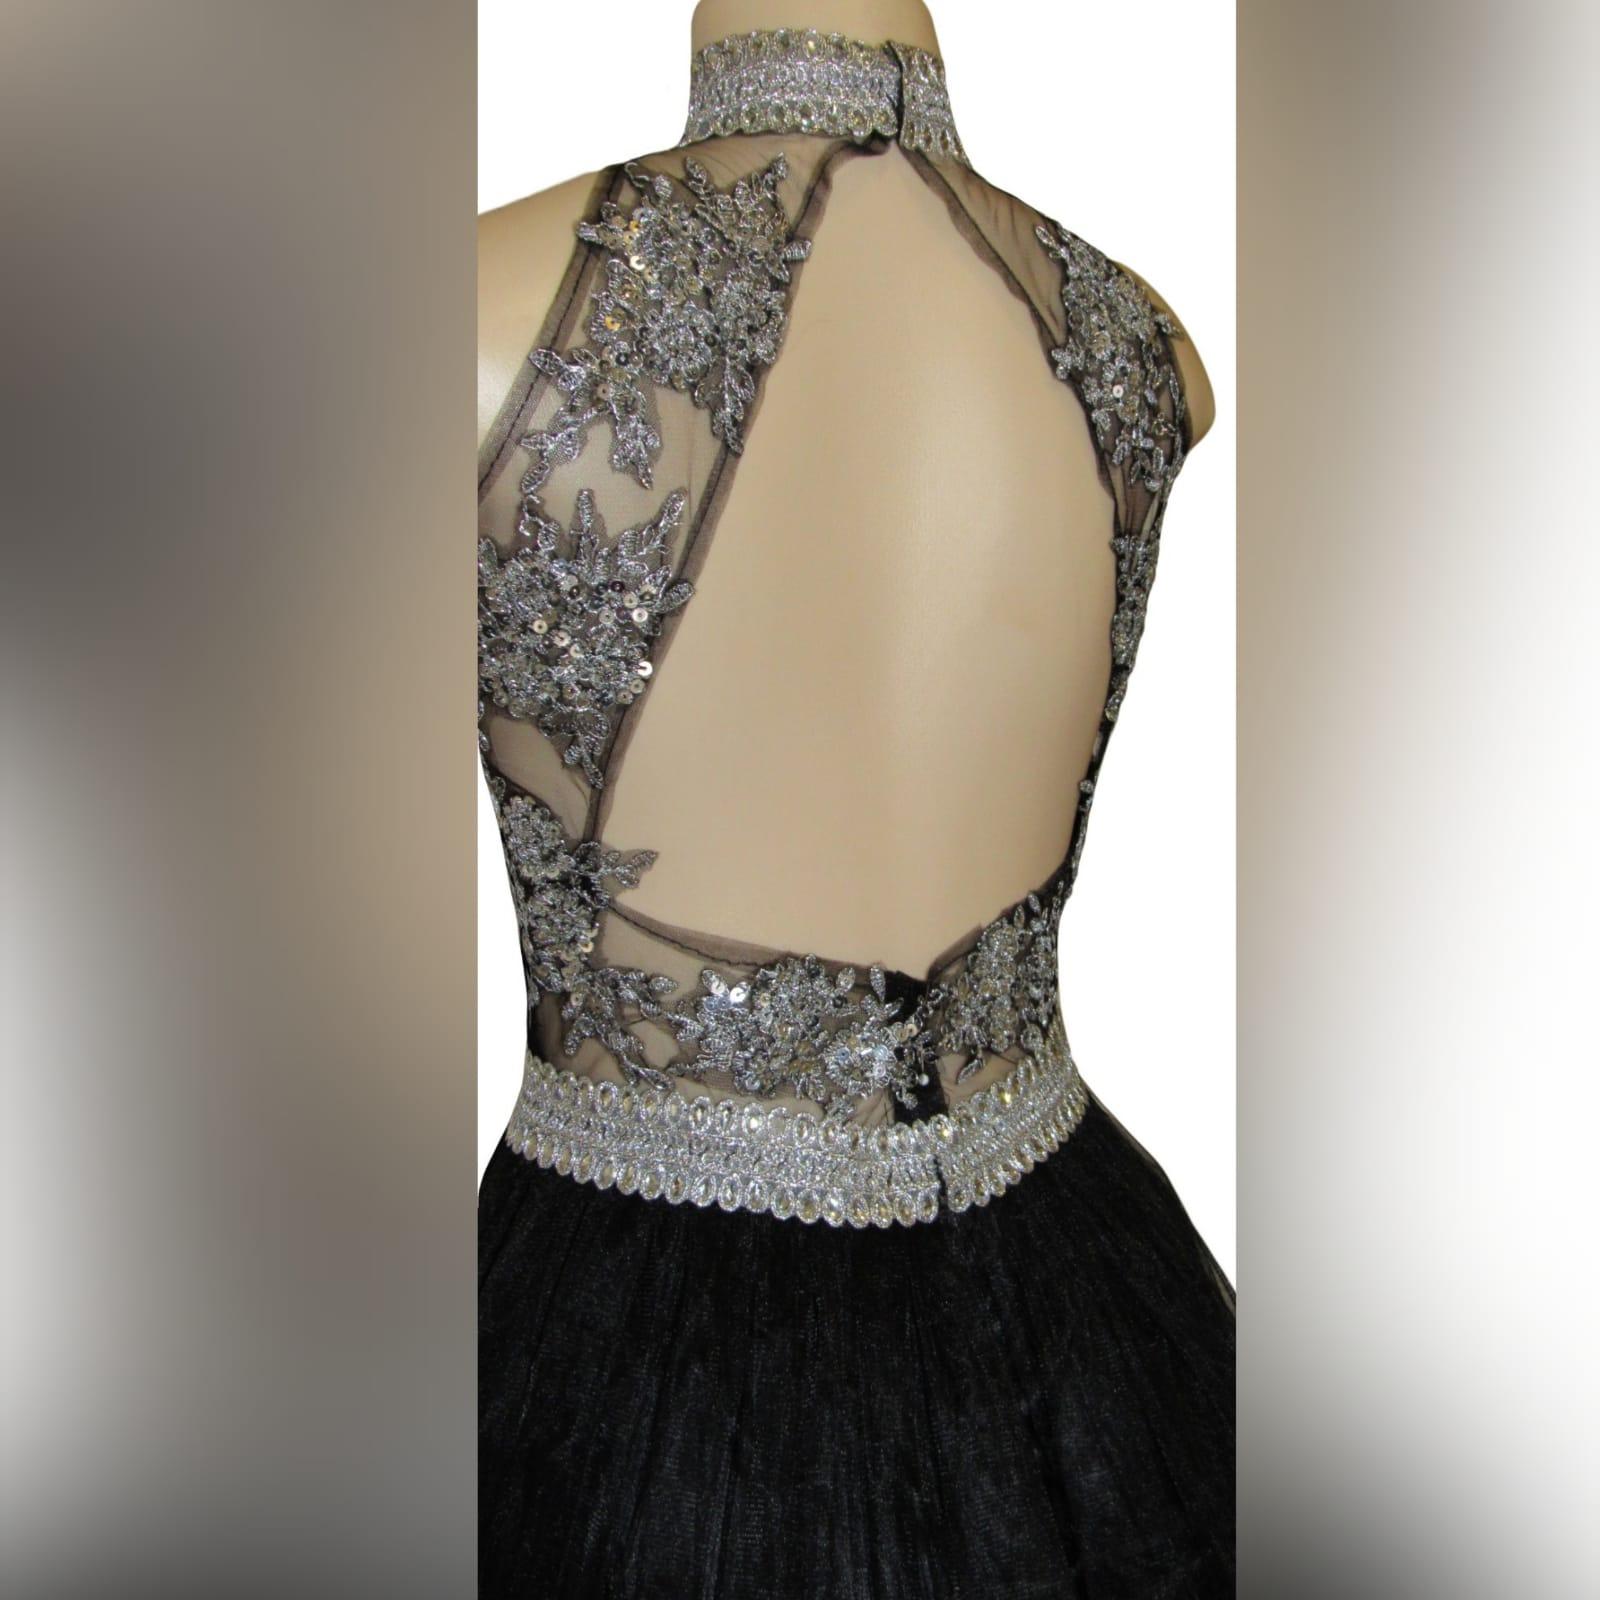 Black & silver long elegant prom dress 3 black & silver, long & elegant prom dance dress with a triangular open back. Choker neckline and an under bust bling belt with train.